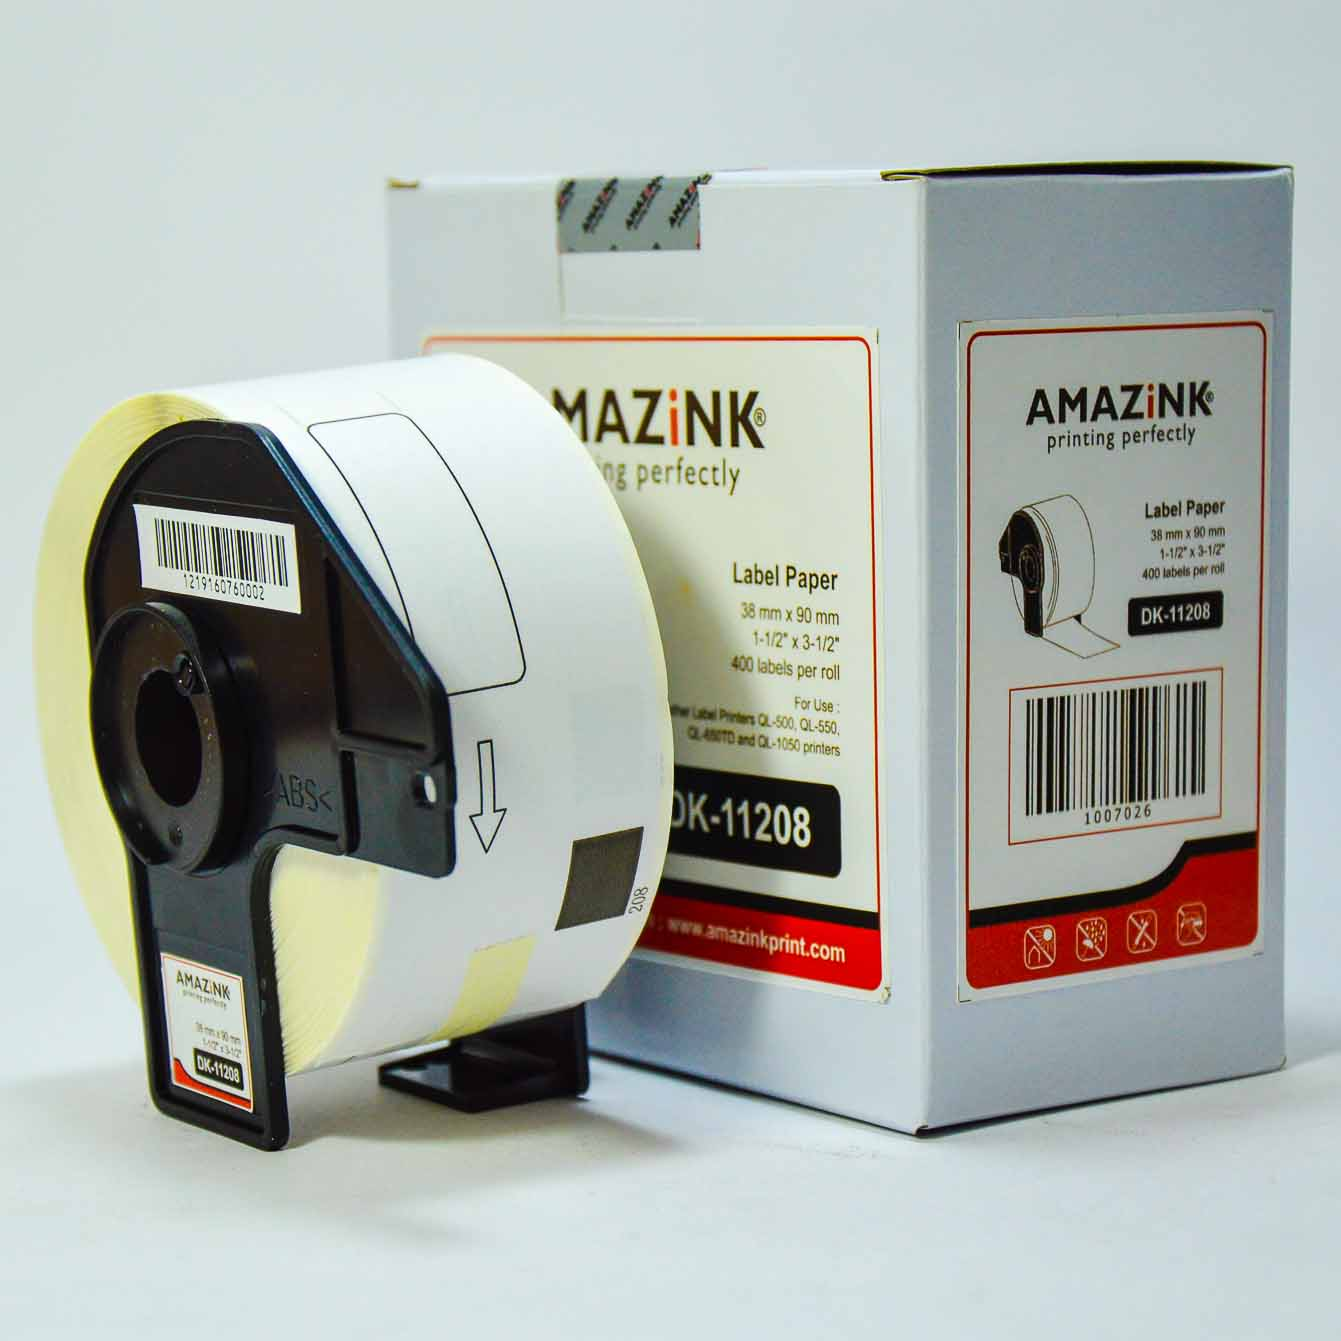 amazink_product-1.JPG